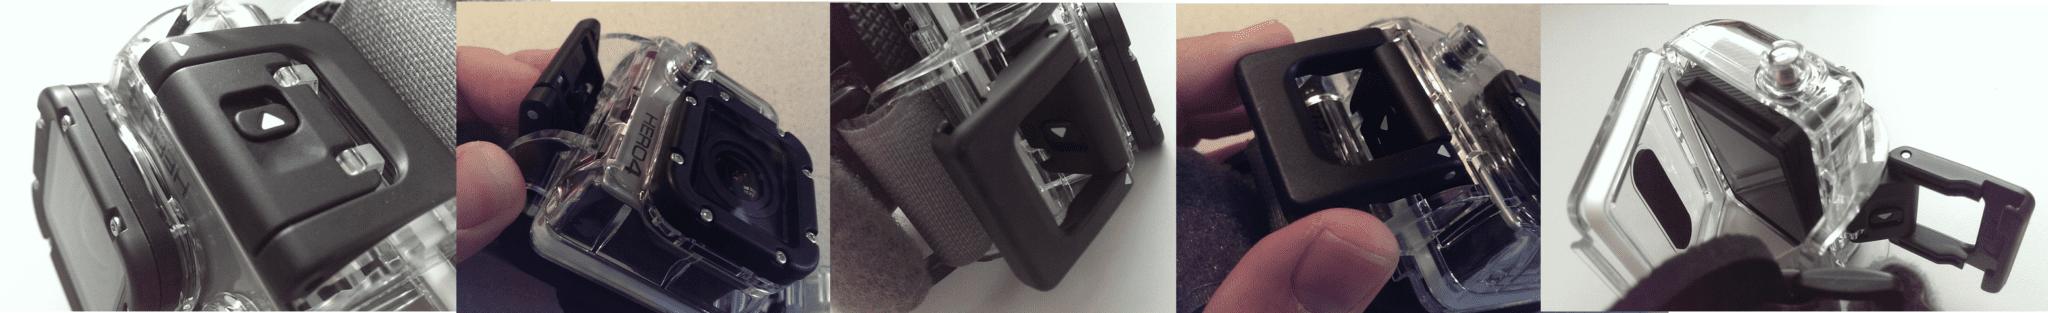 GoPro Wrist Housing Latch Opening